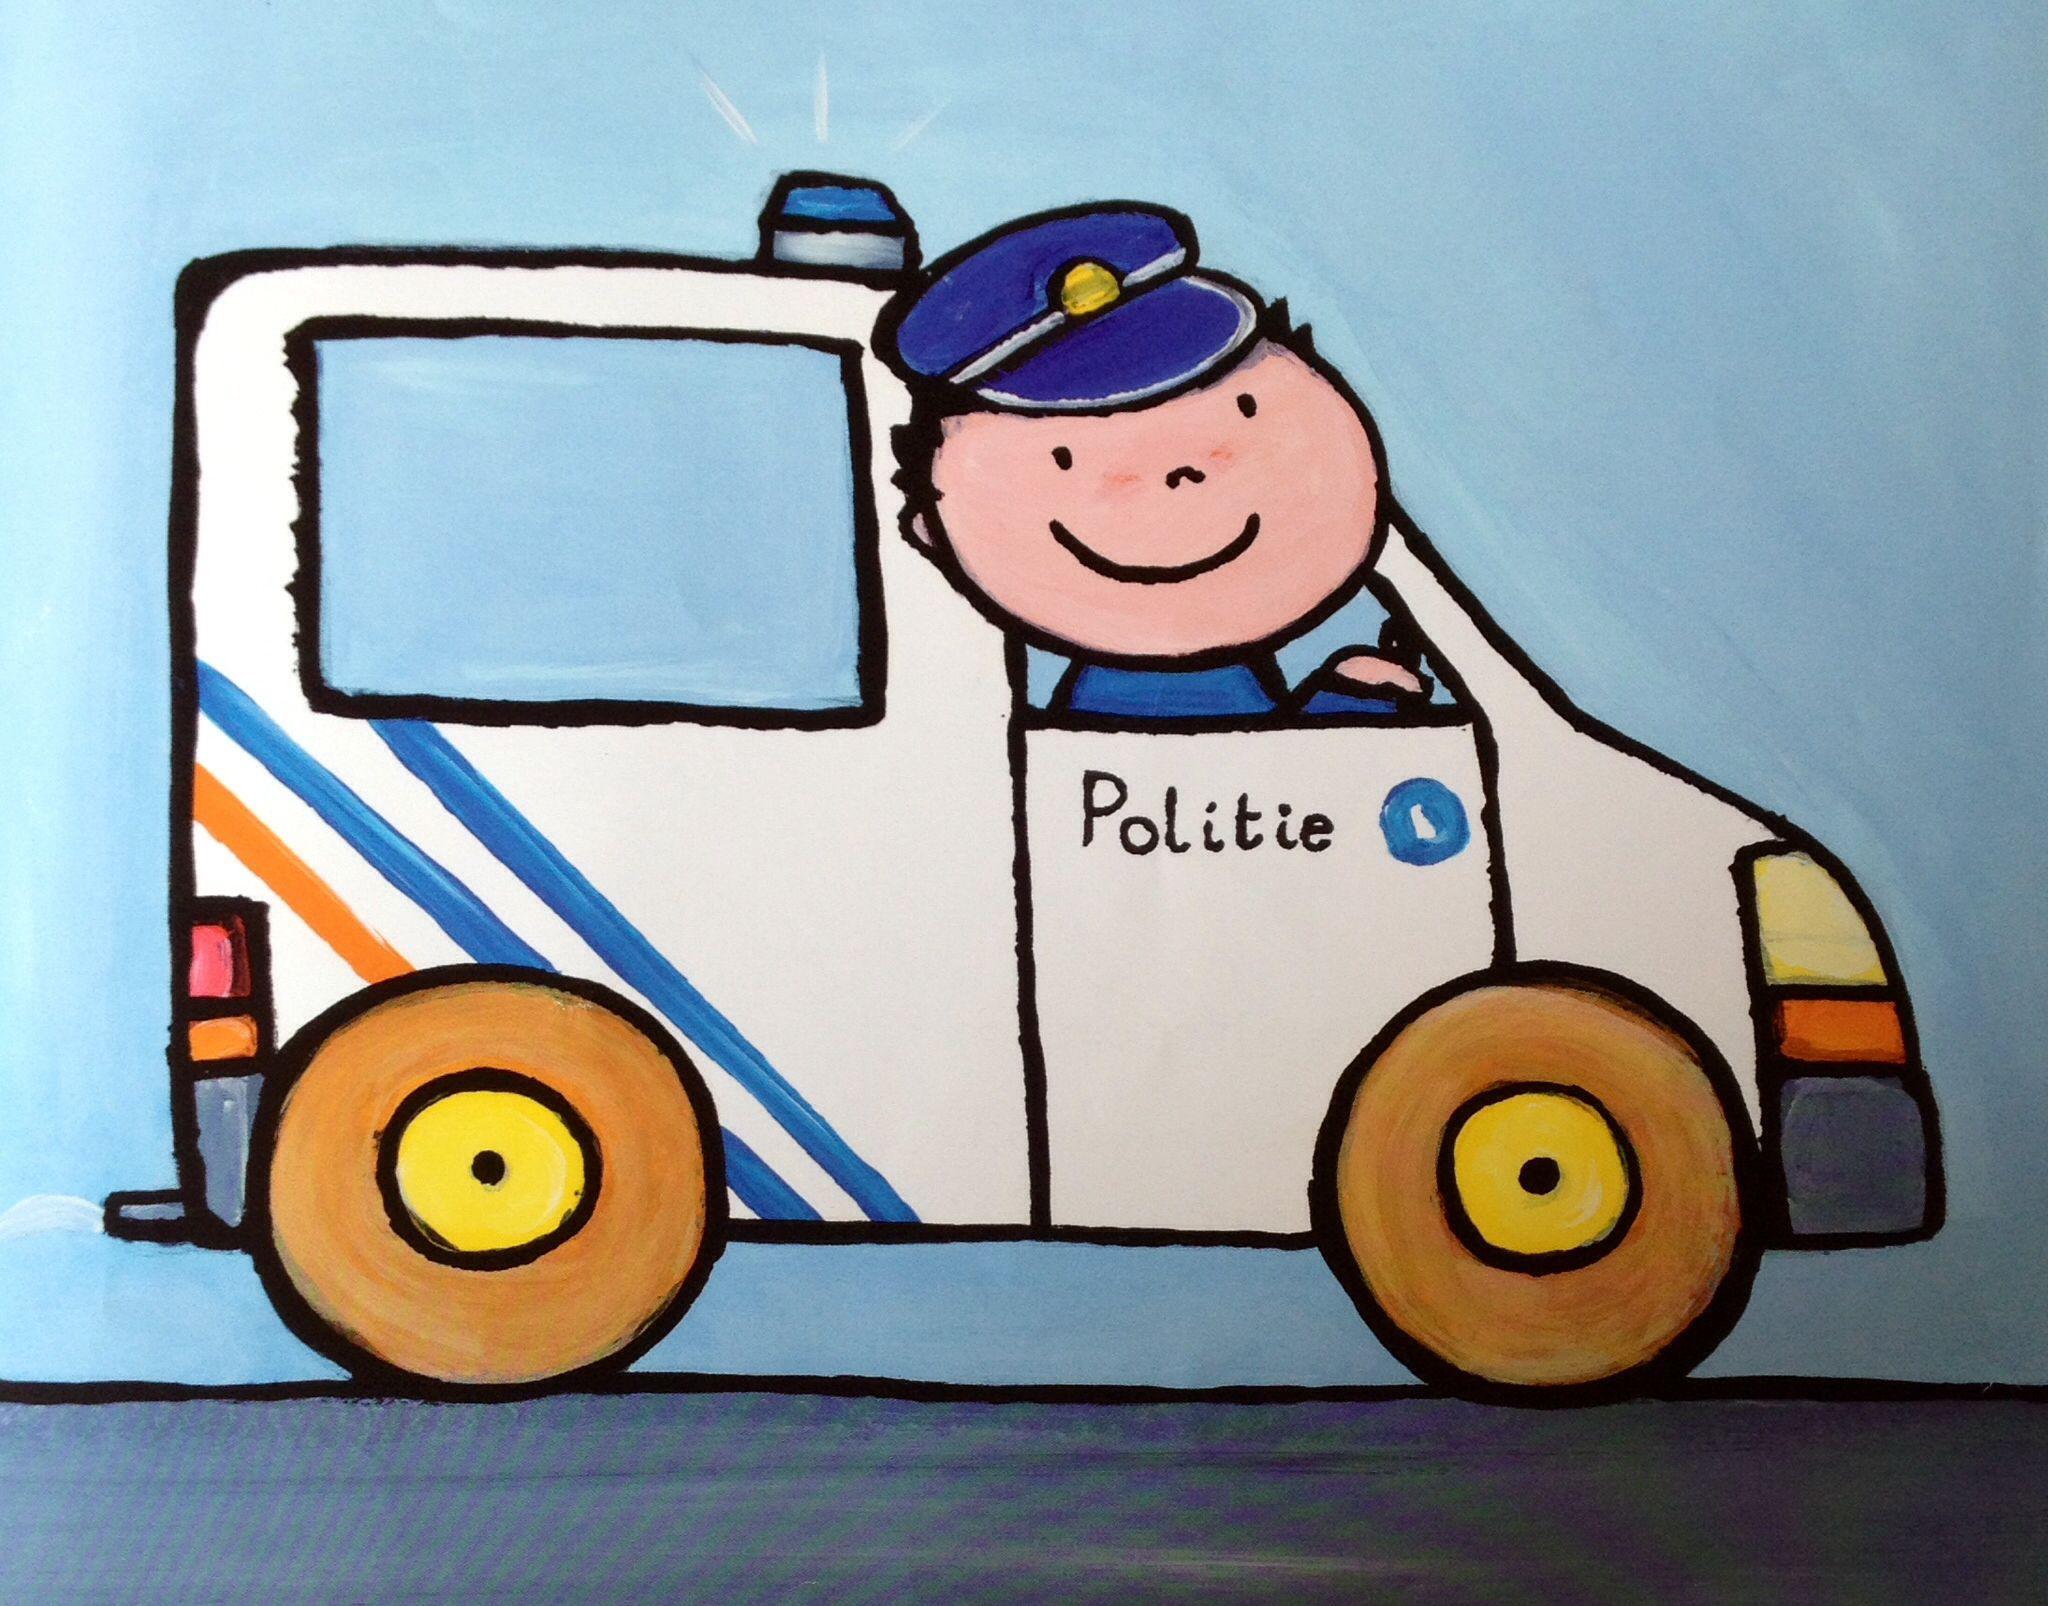 Politiecombi Politie Politiefeestje Thema